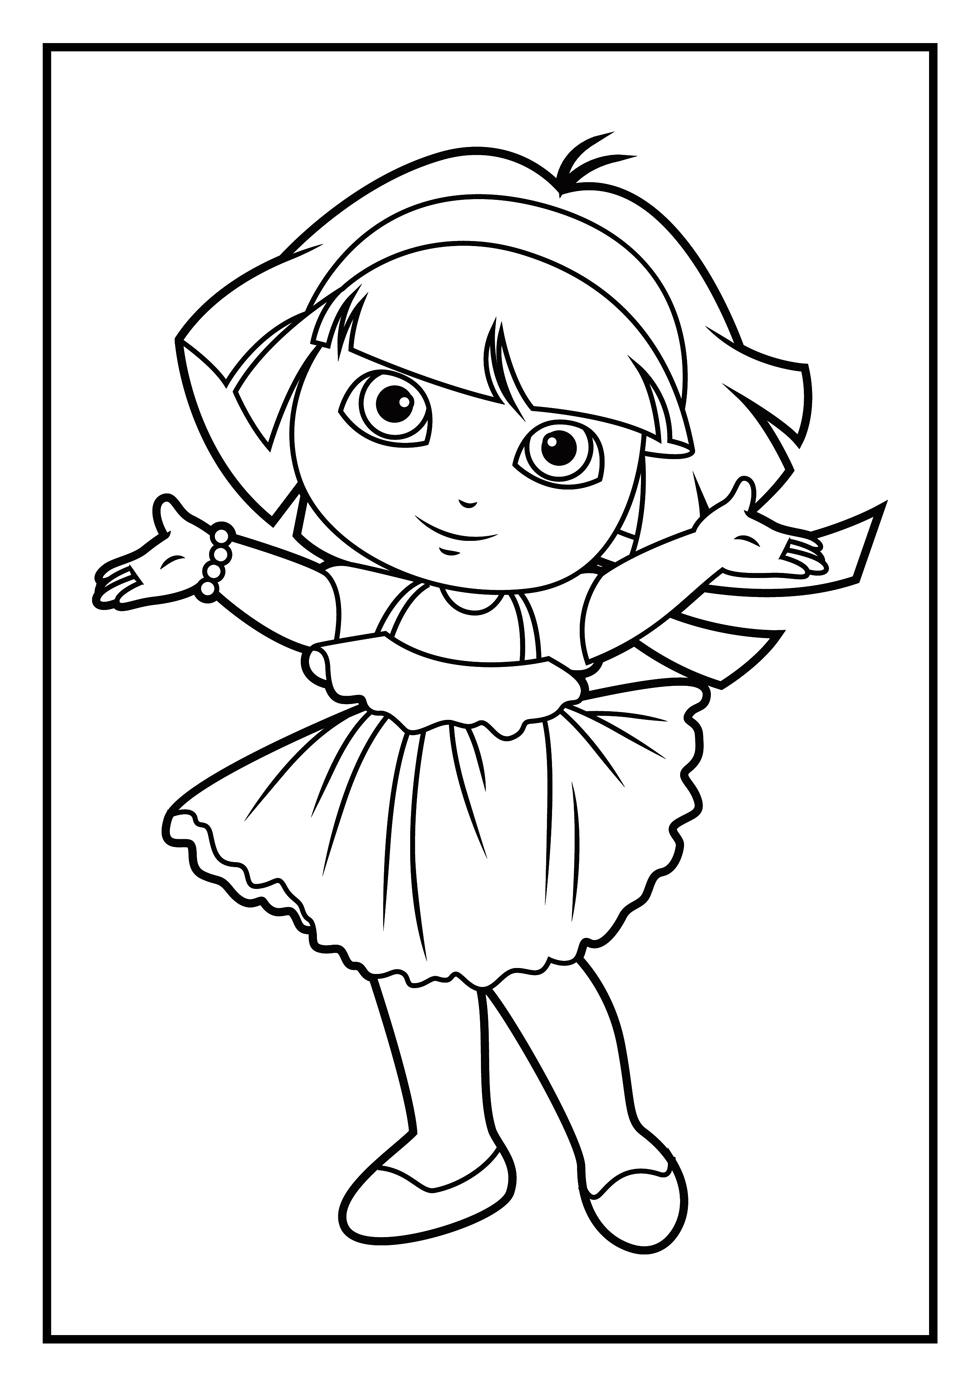 dora coloring page print download dora coloring pages to learn new things dora coloring page